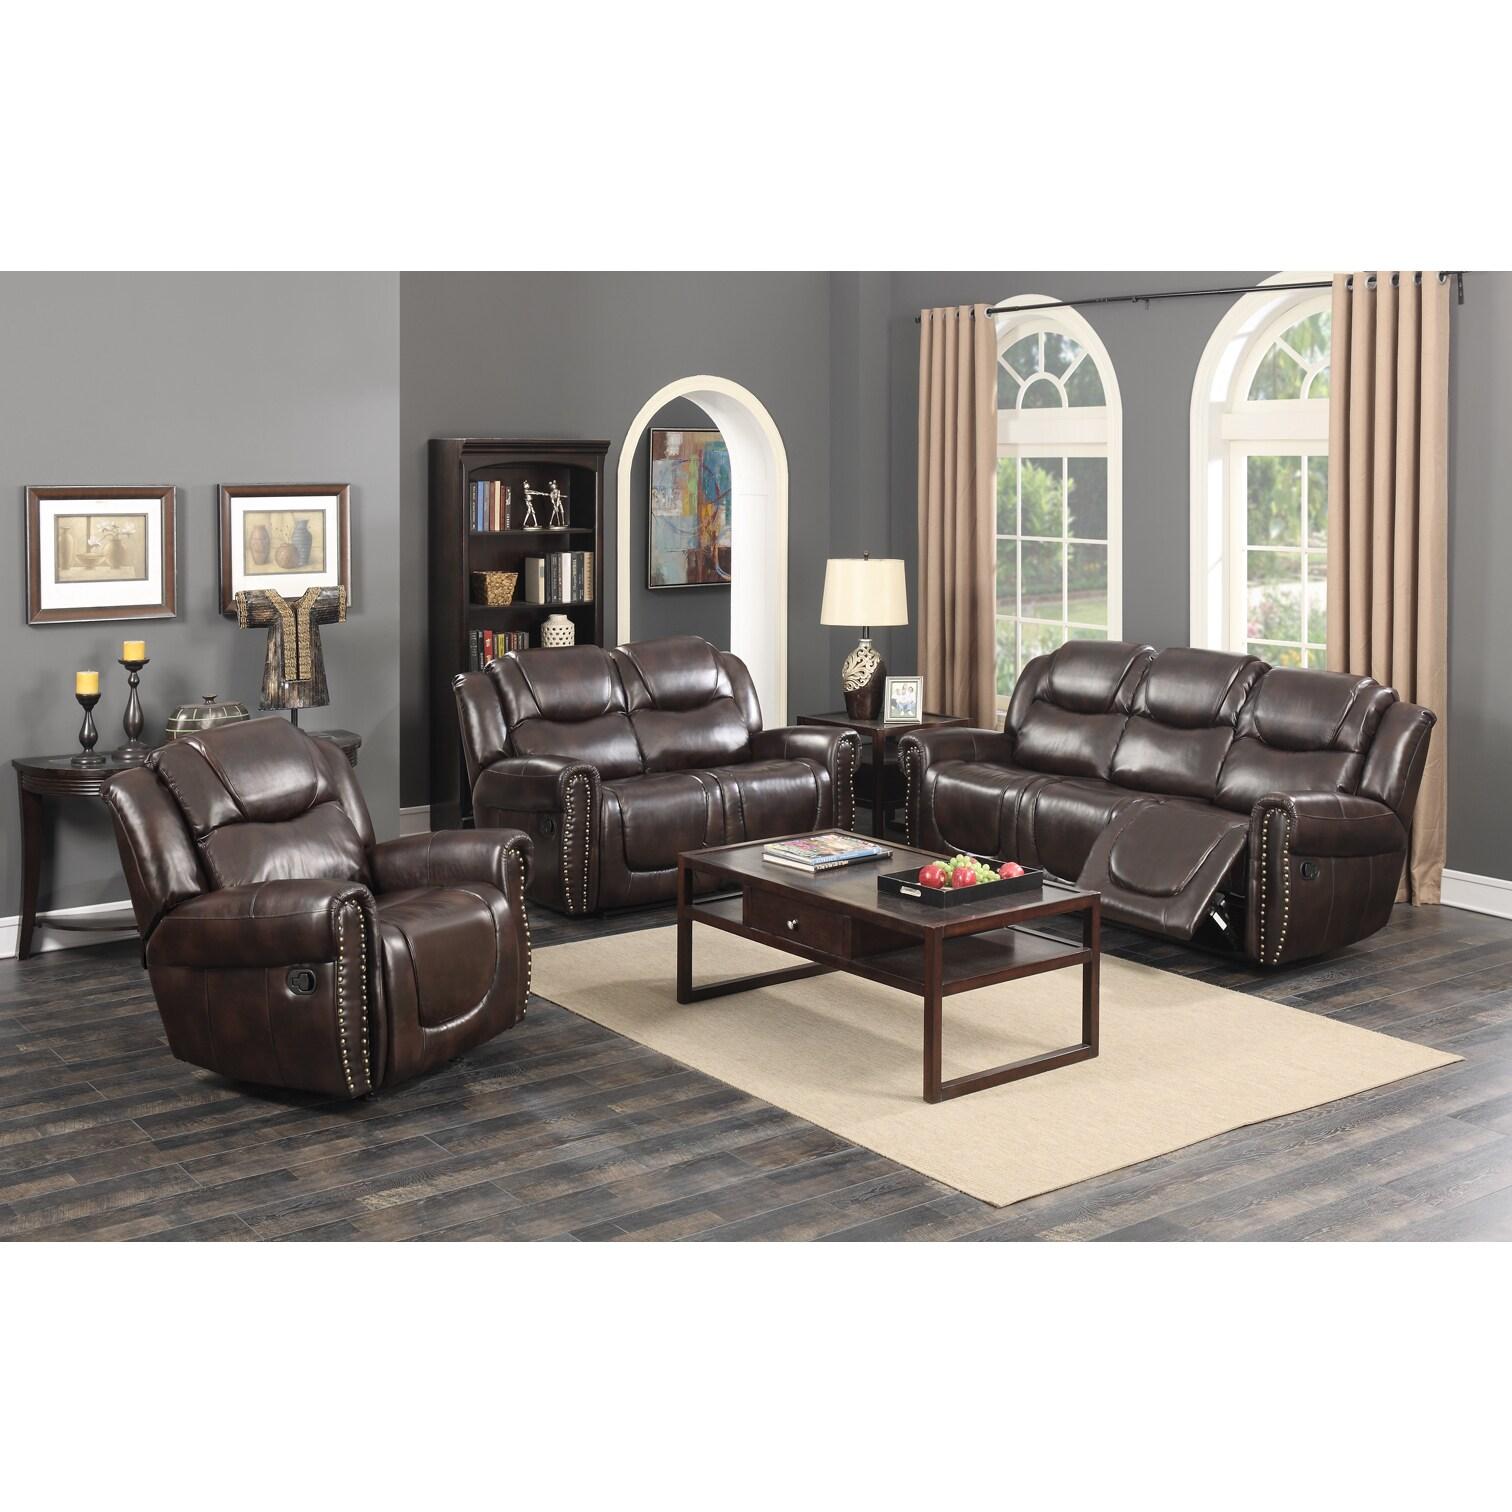 Shop Manhattan Dark Brown Bonded Leather 3 Piece Living Room